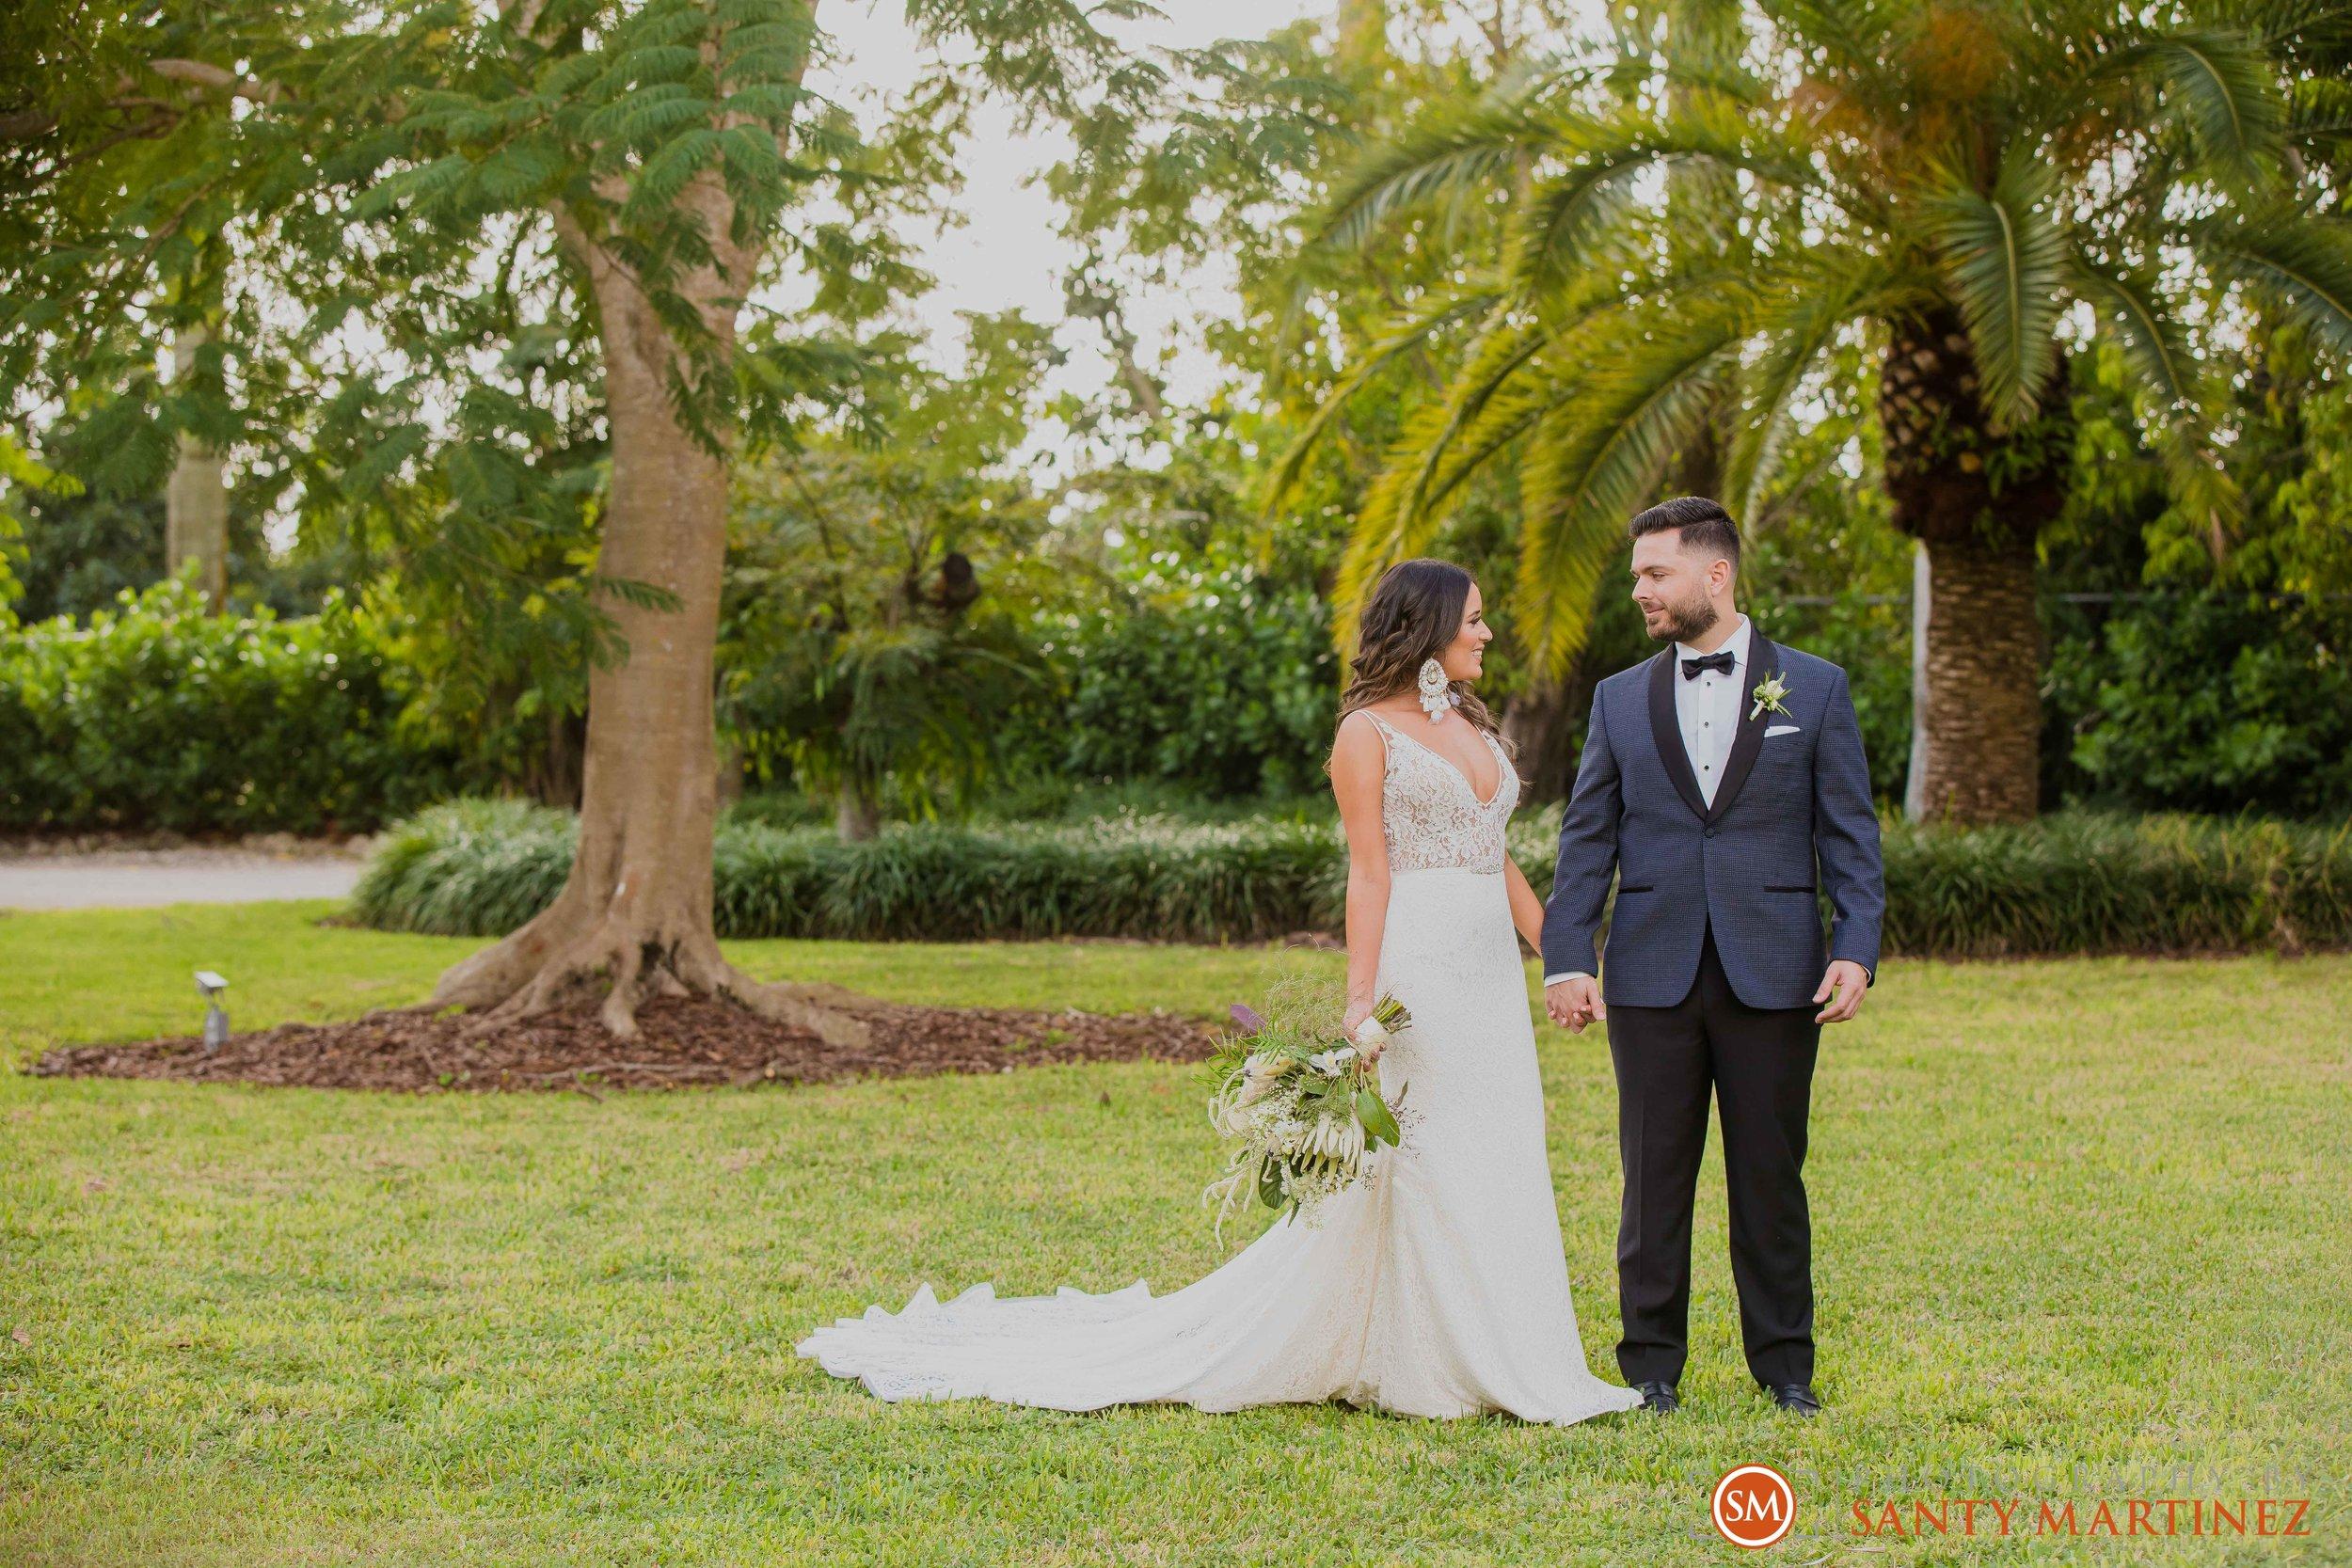 Whimsical Key West House  - Wedding - Santy Martinez-26.jpg